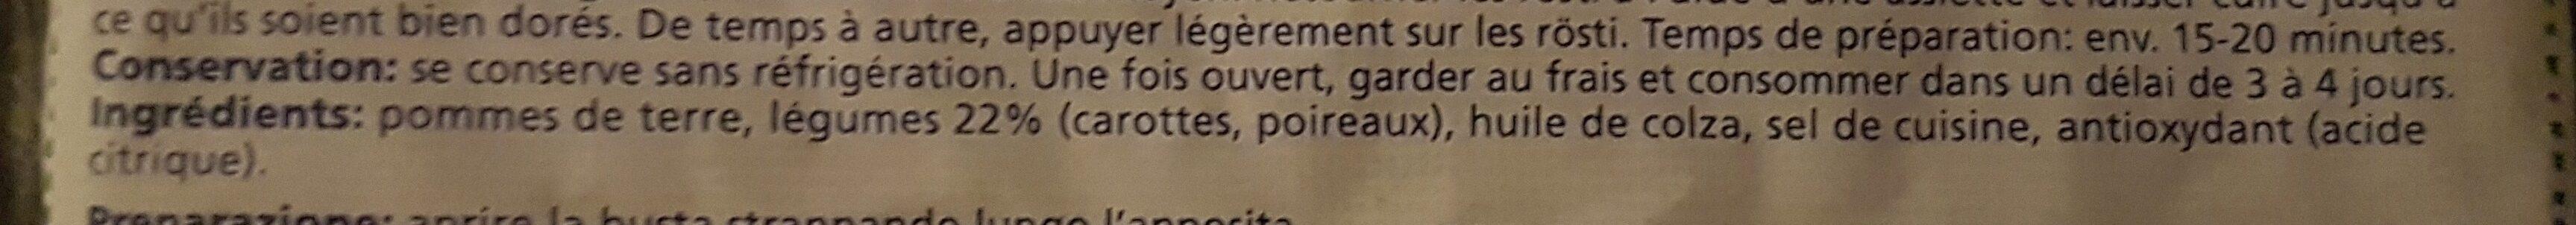 Gemüse Rösti - Ingrédients - fr